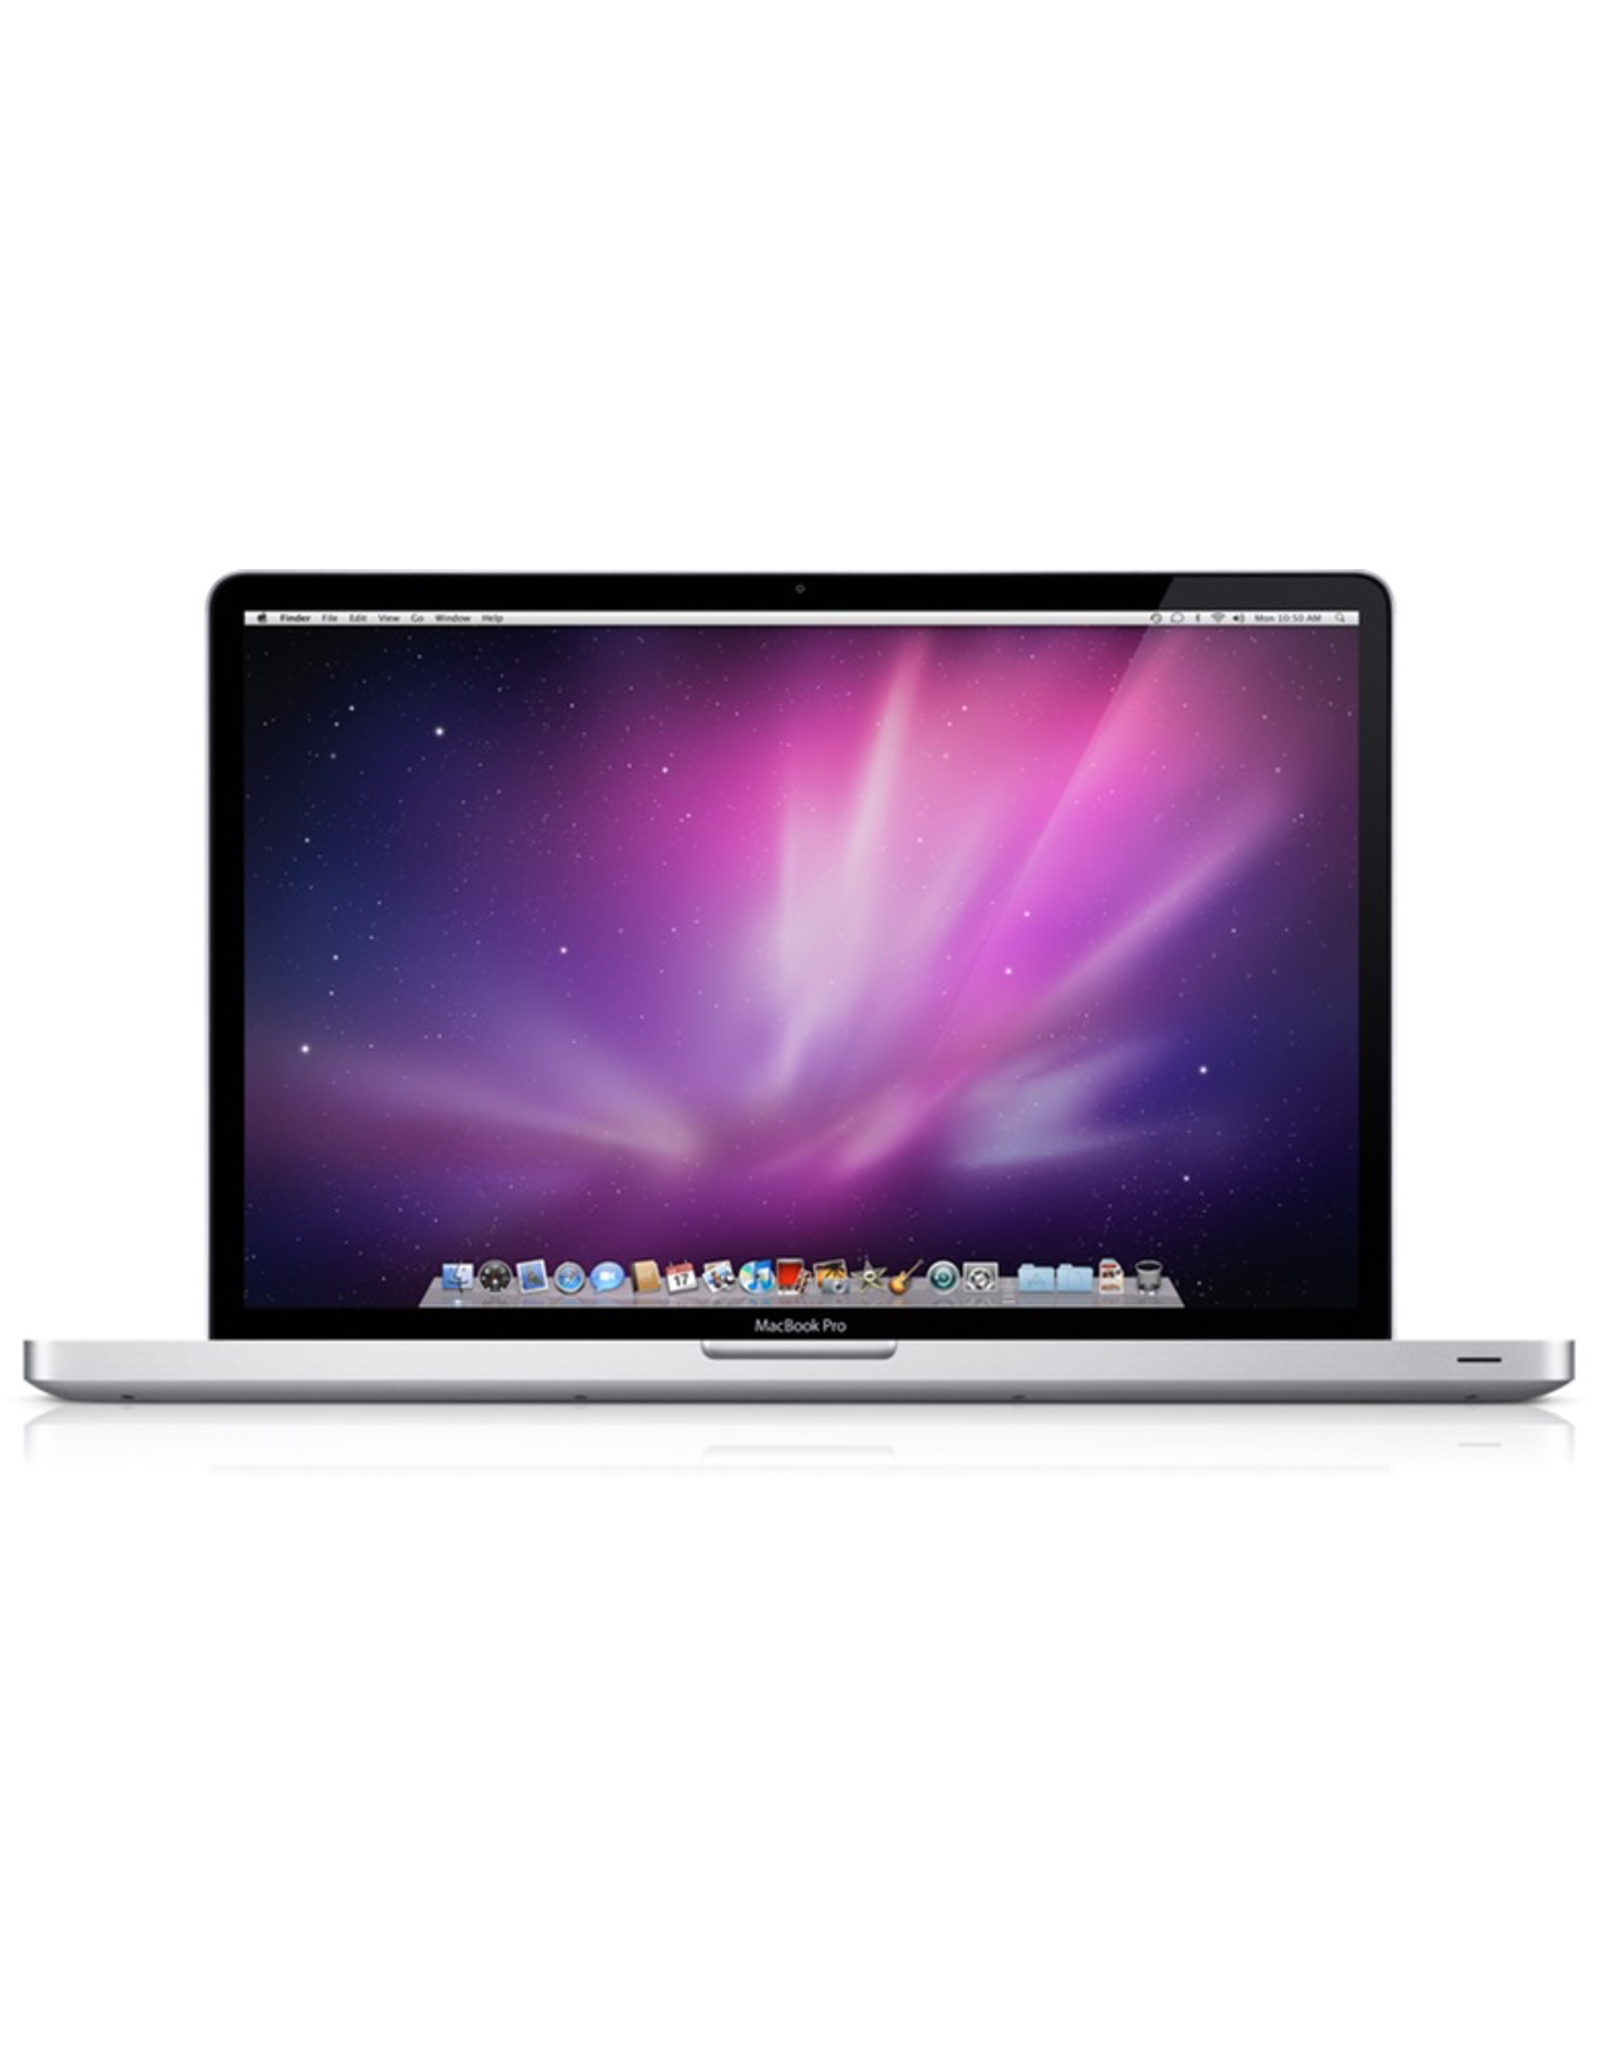 Apple MacBook Pro (17-inch, Early 2011) Intel Core i7 @ 2.2GHz /8GB RAM/ 120GB SSD/ 30 Day Exchange